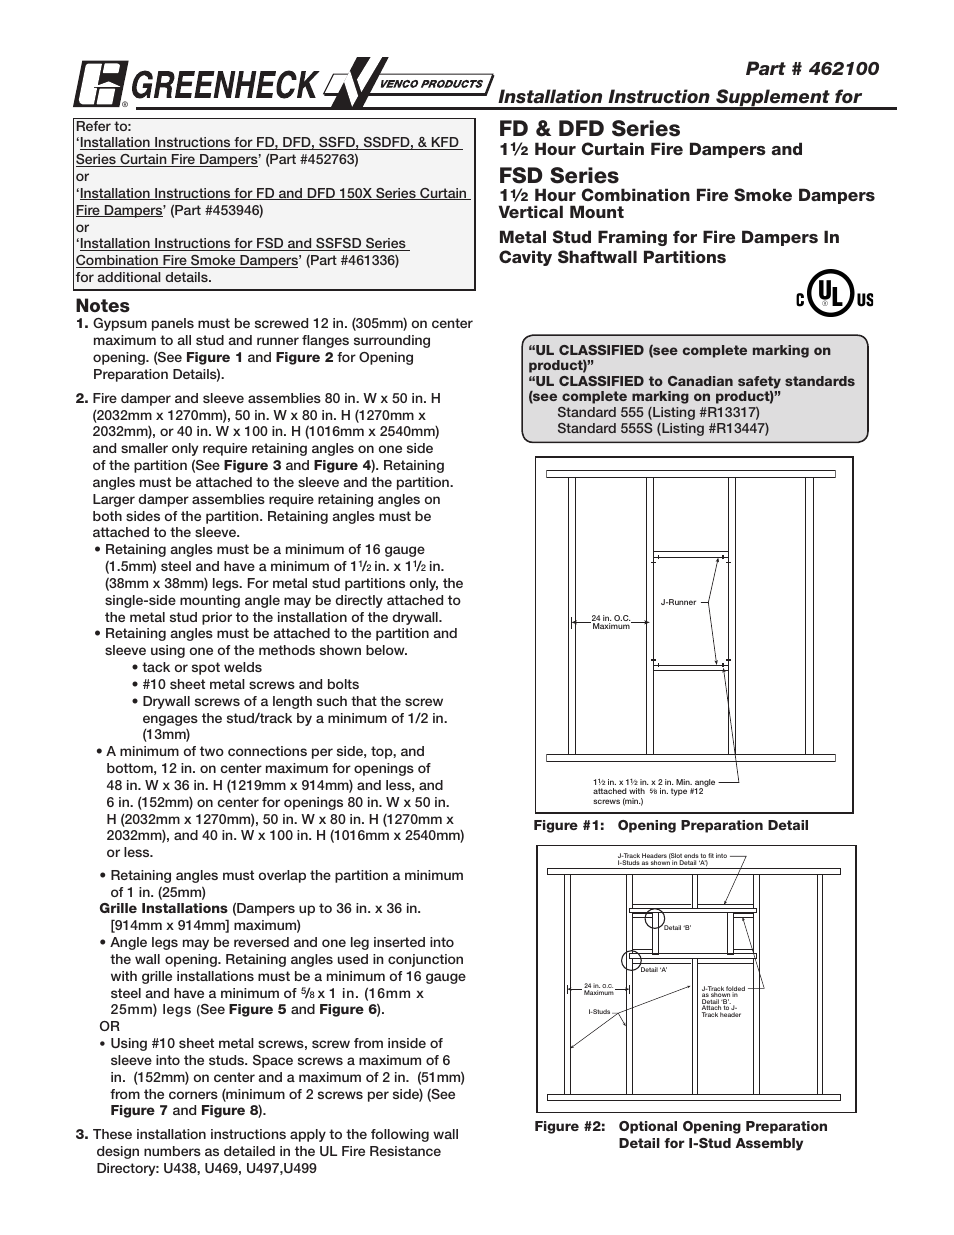 Greenheck Fan Firestop Material Dfd Series User Manual